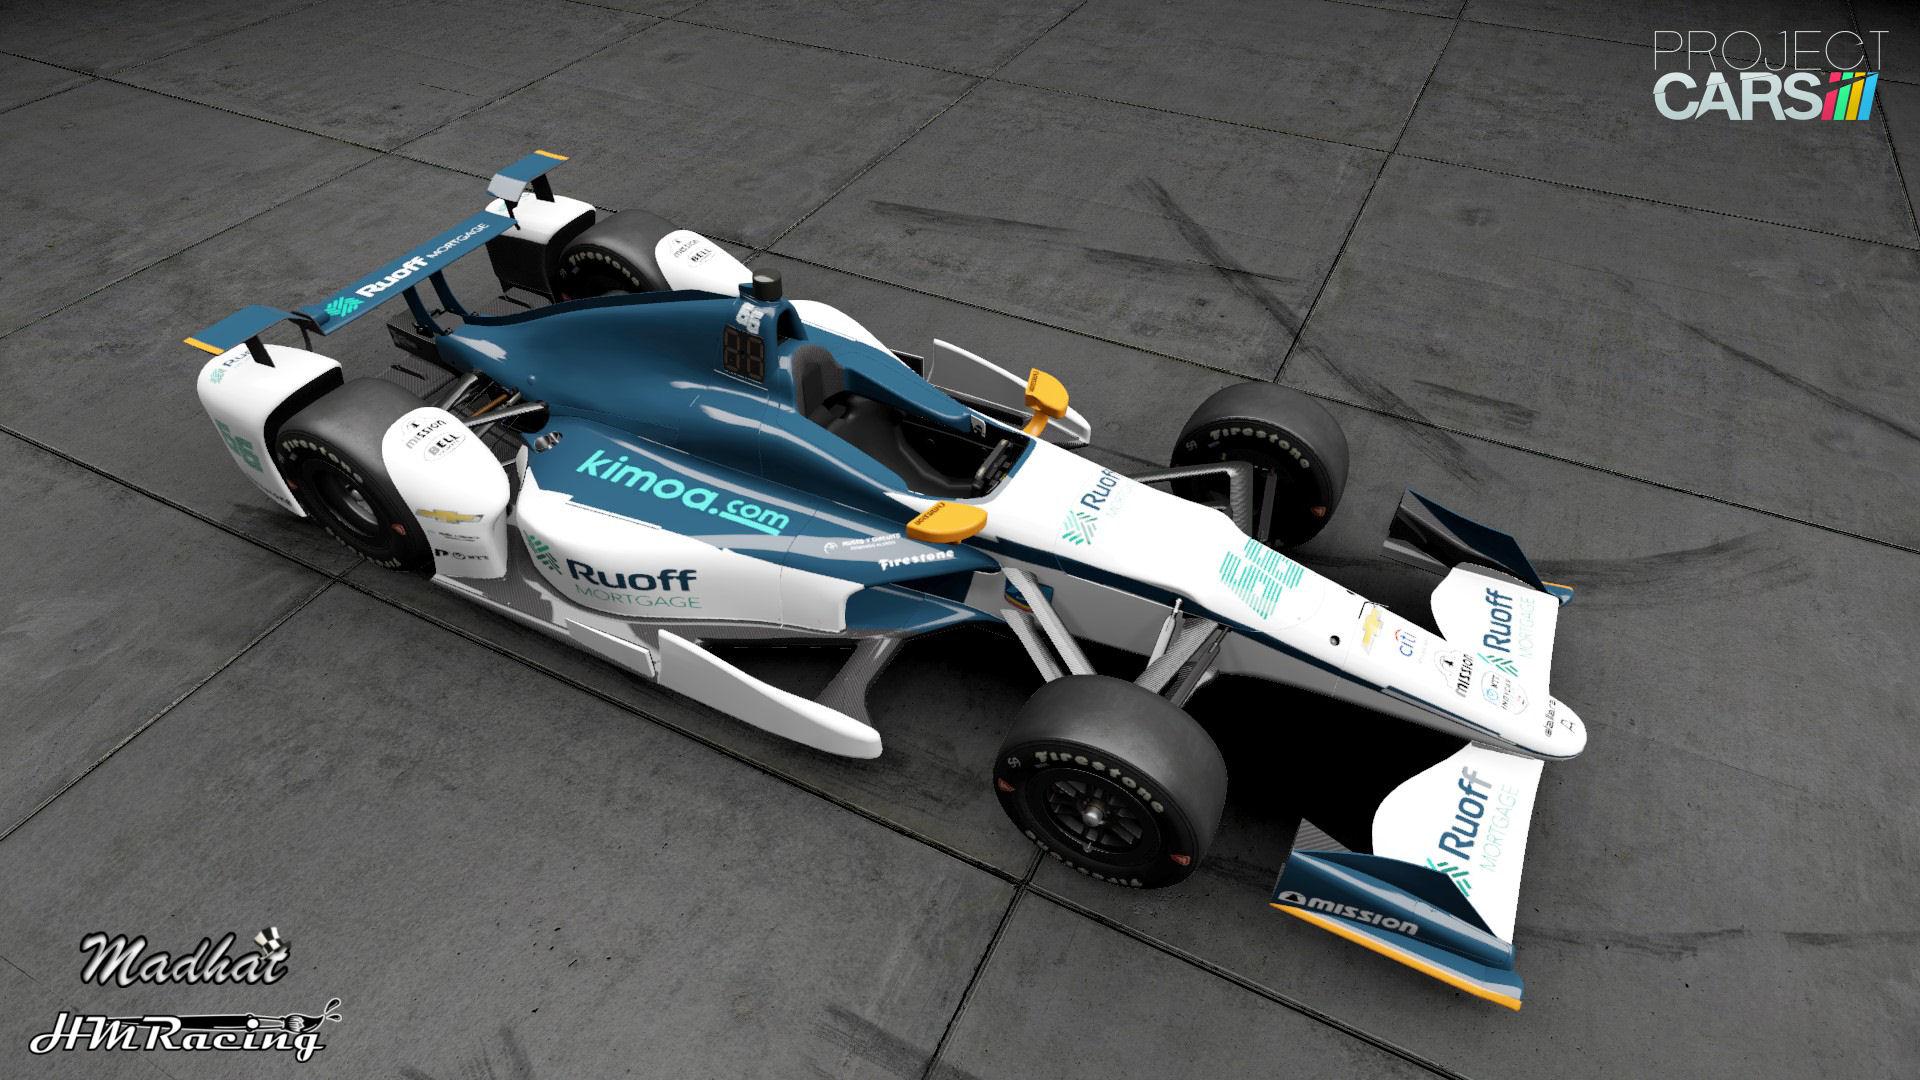 Fernando Alonso 2020 Indy 500 Mclaren dallara dw12 chevy oval 01.jpg